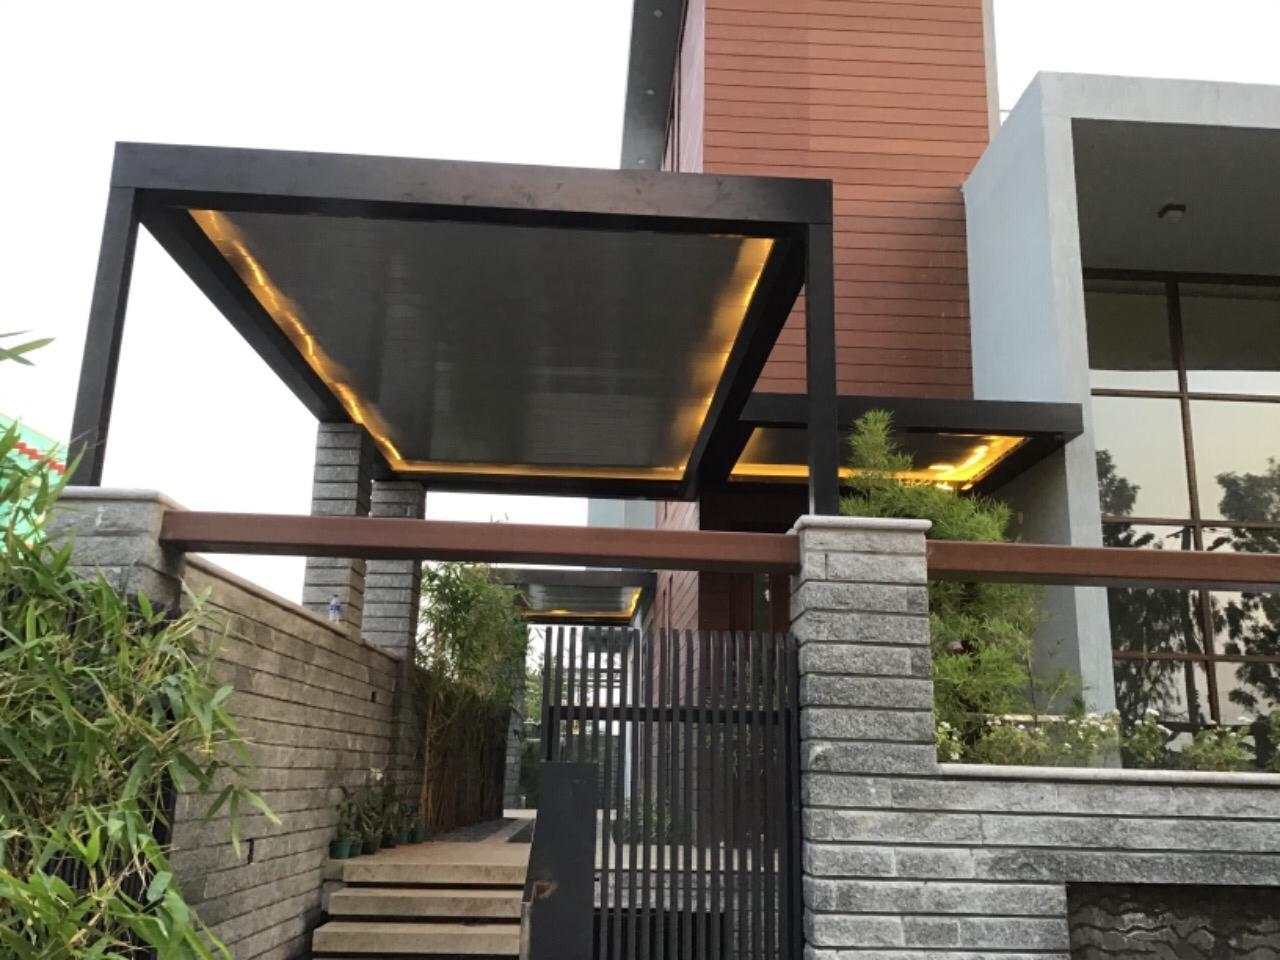 louver7 Louver Architectural